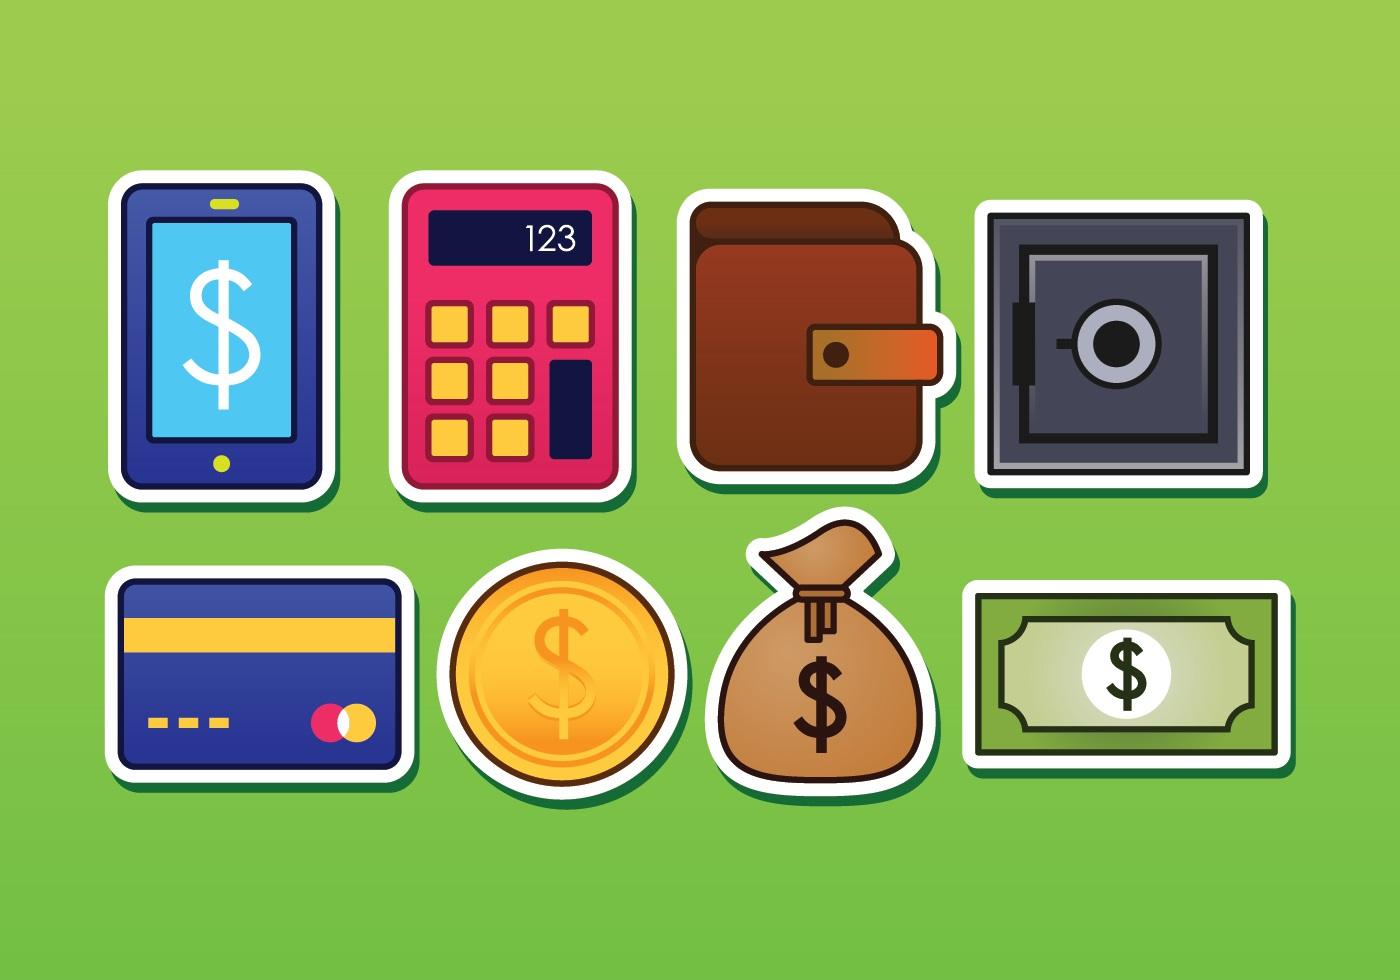 free banking sticker icons